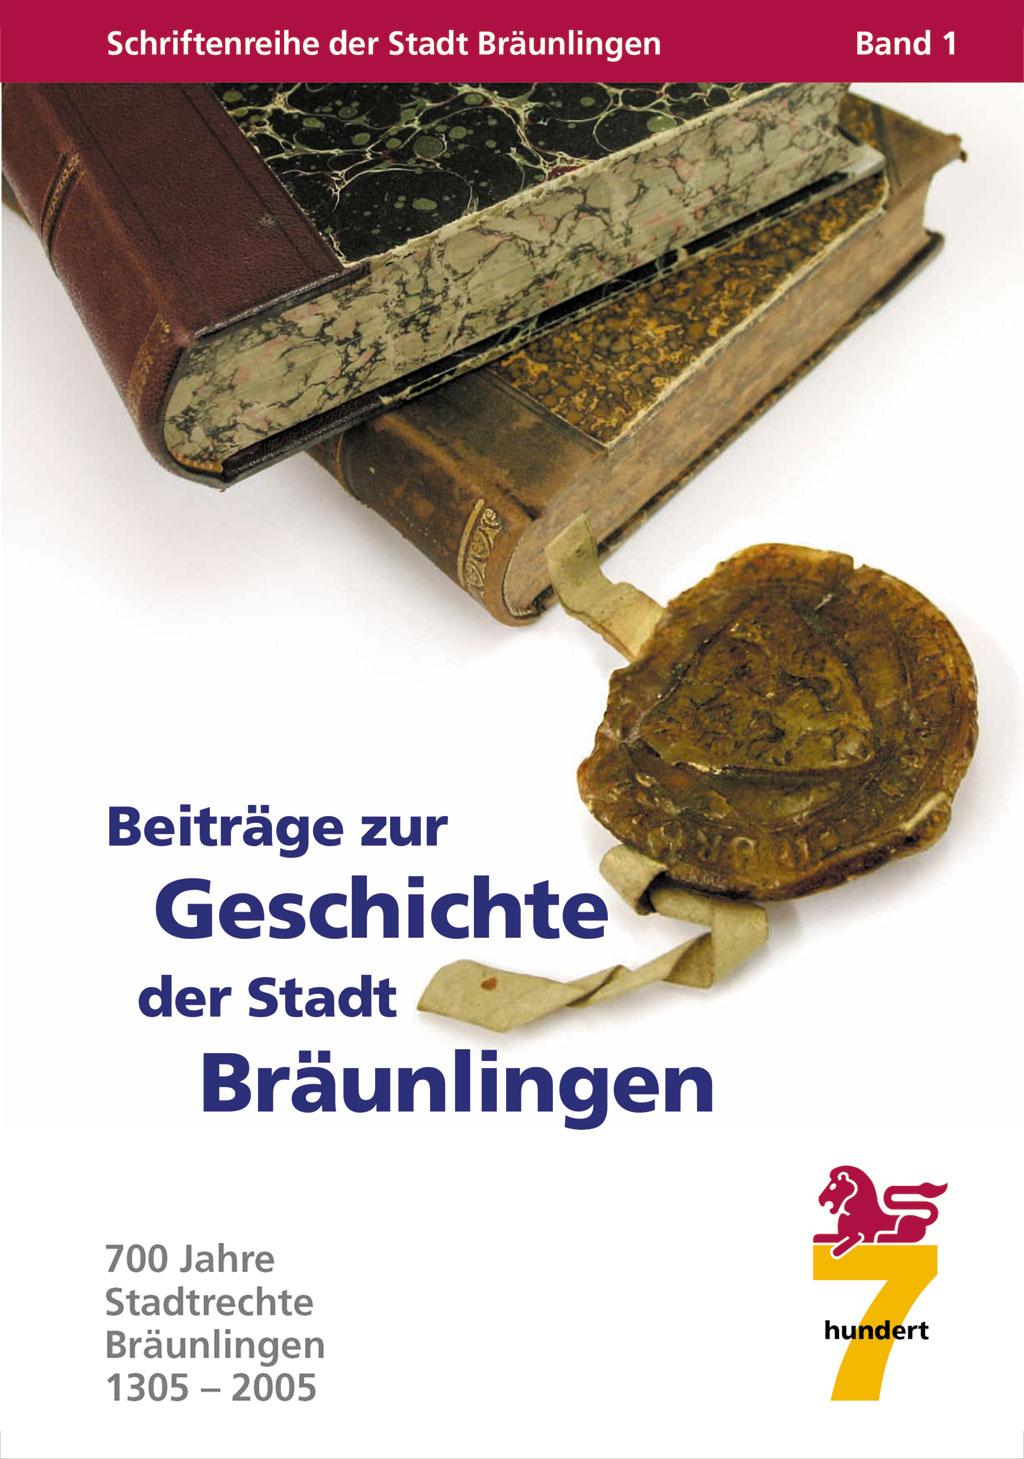 Schriftenreihe der Stadt Bräunlingen Band 1